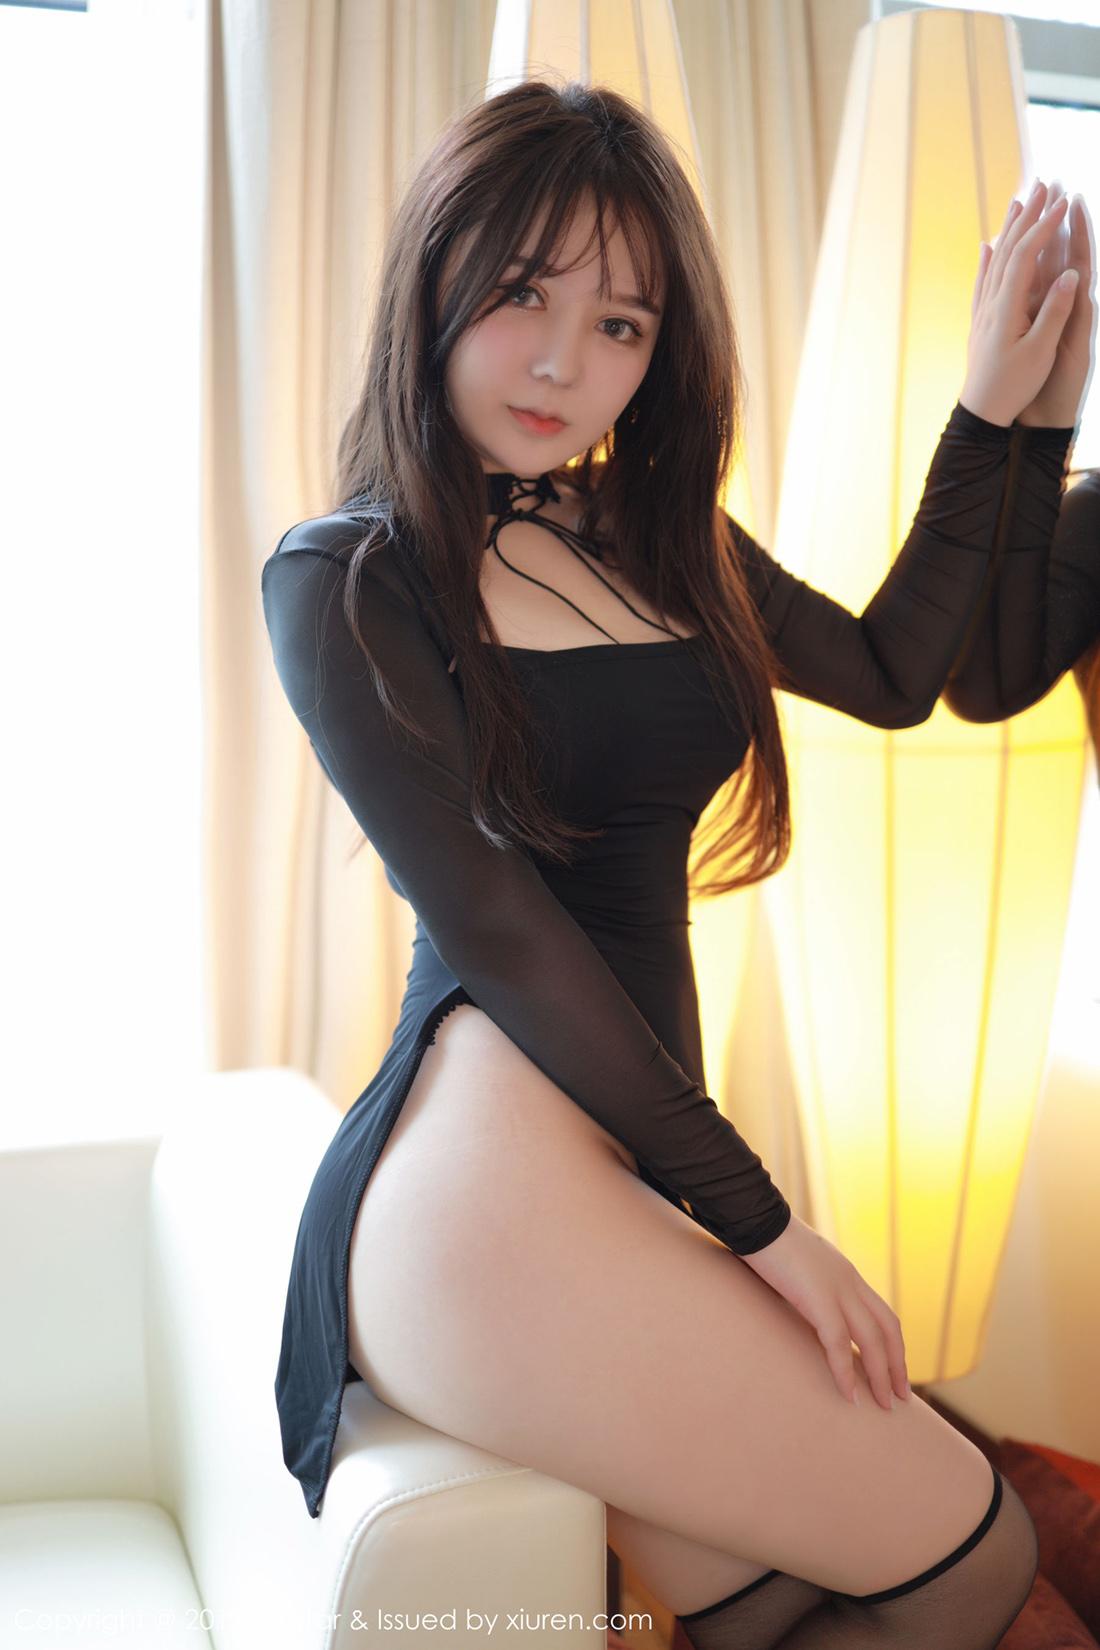 People 1100x1650 women model Asian legs stockings black clothing black dress brunette long hair sitting women indoors dark hair Xiuren